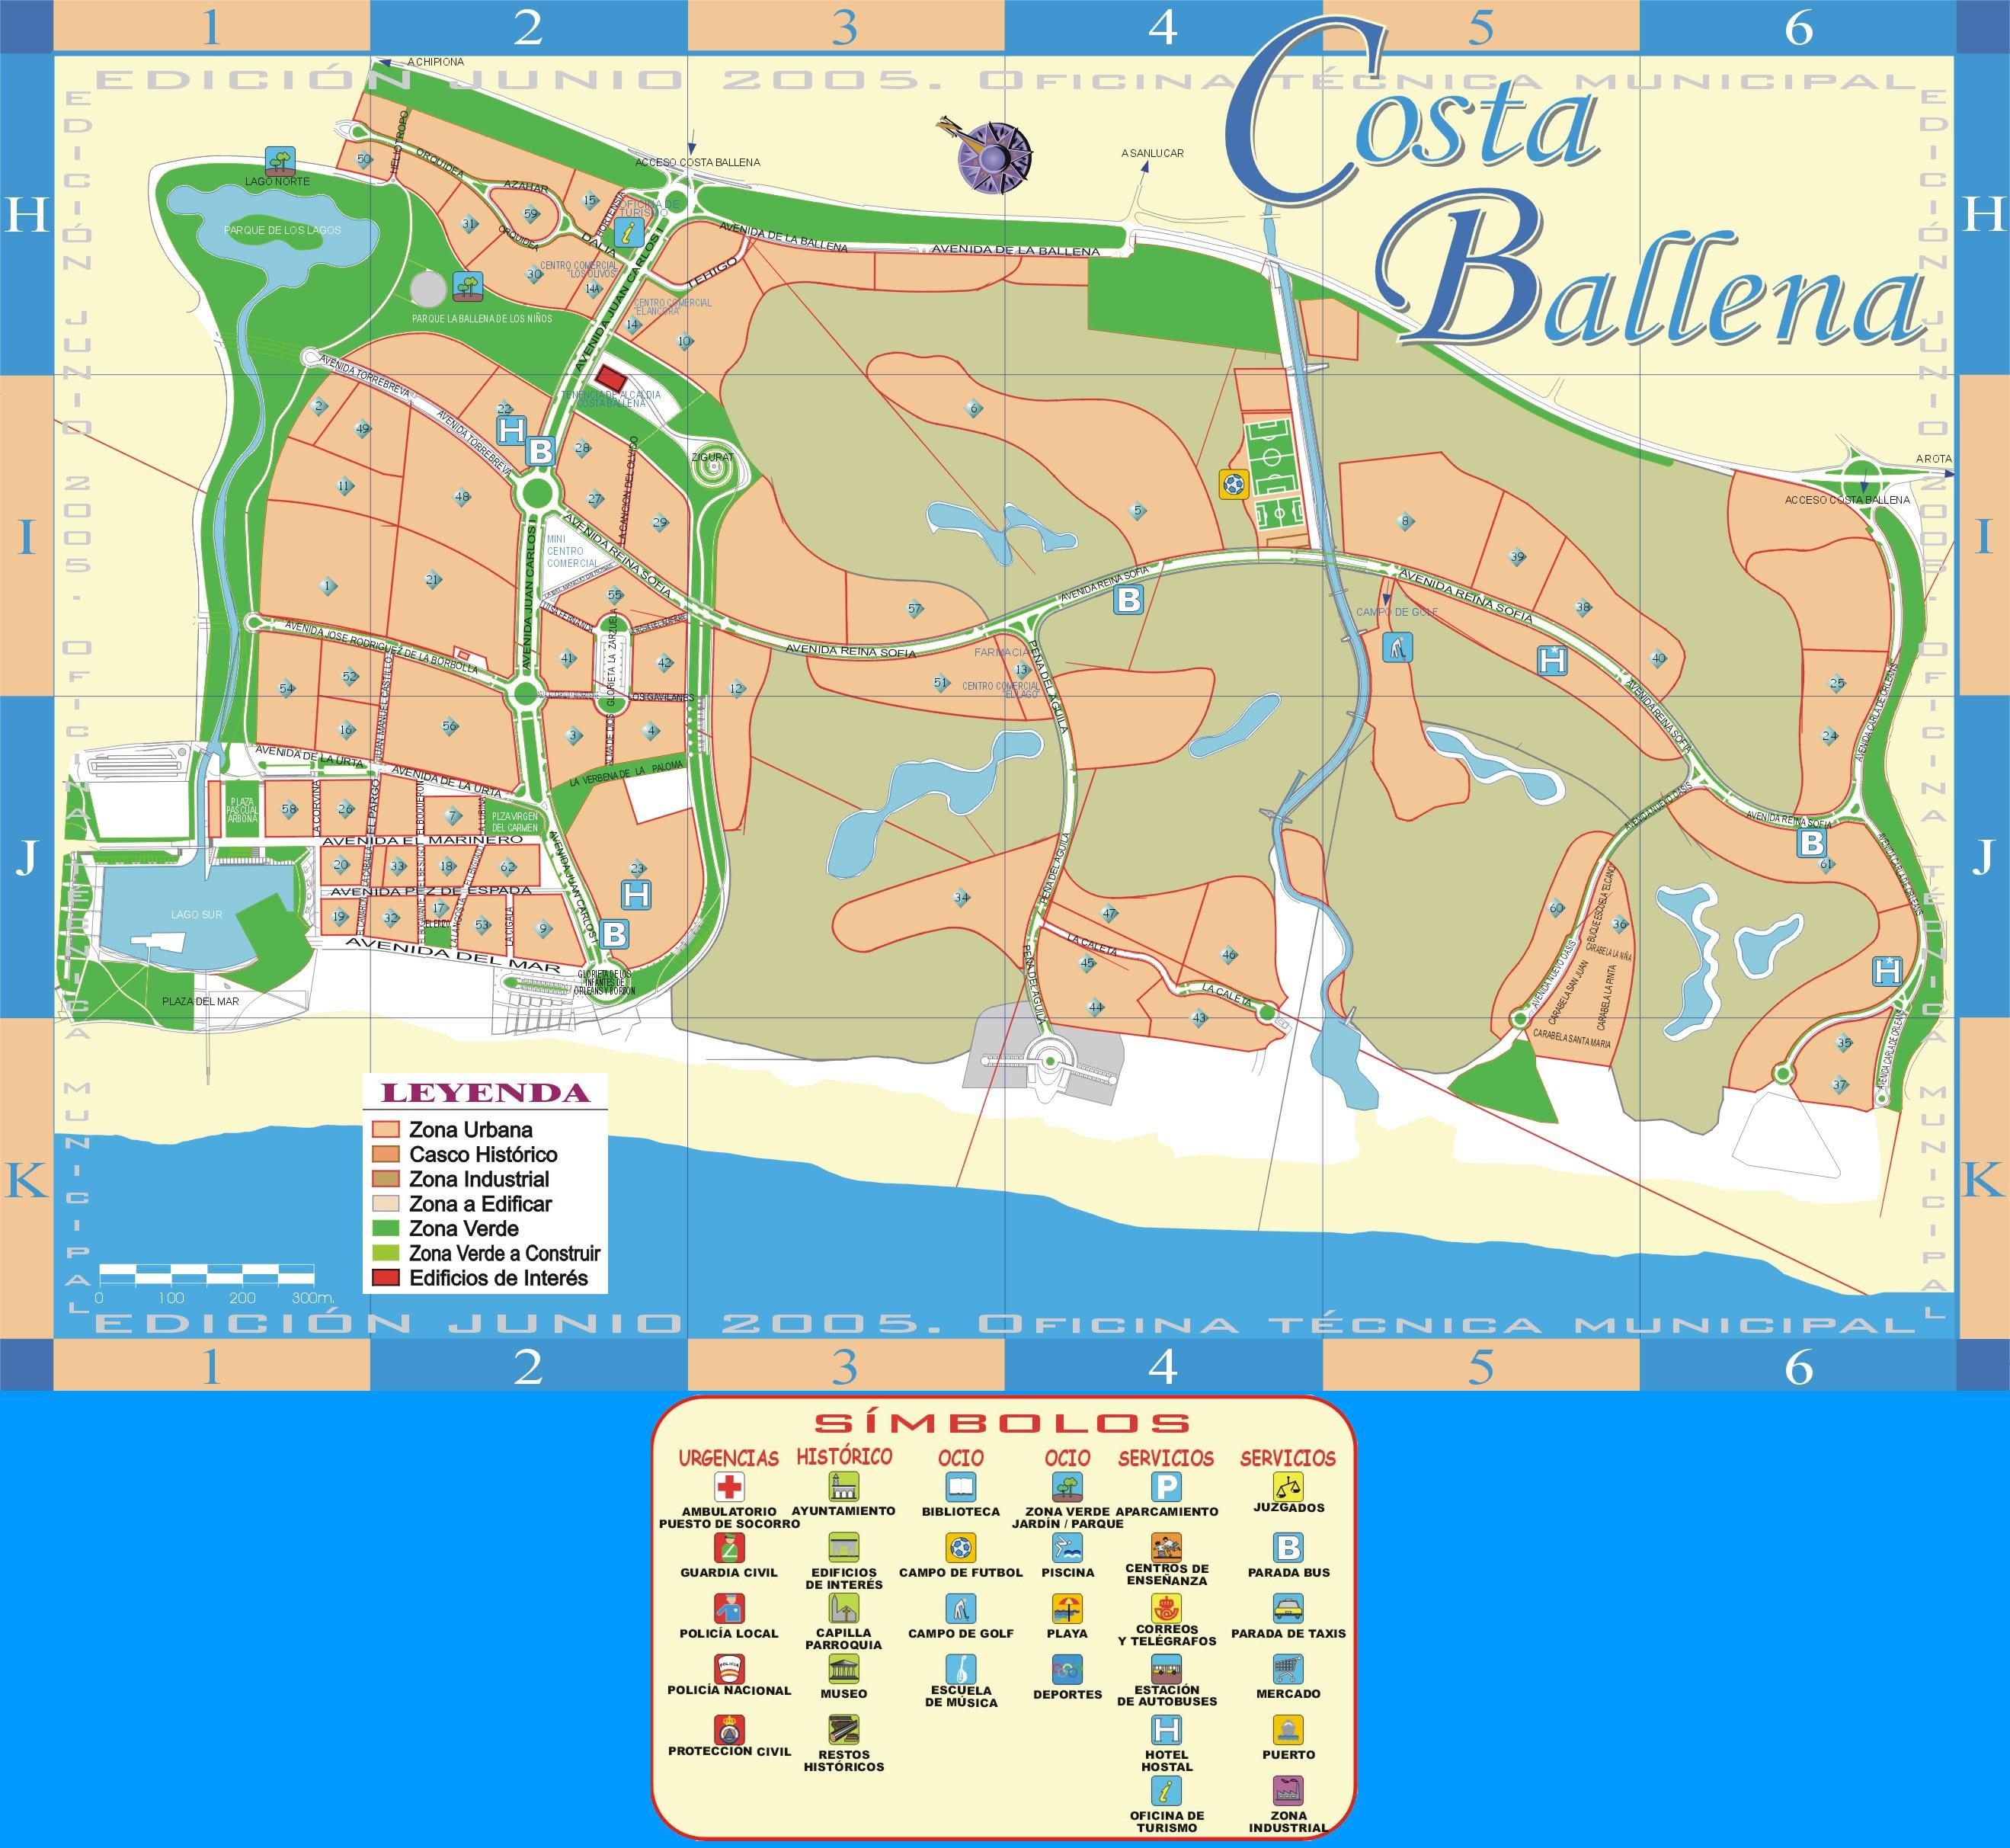 Mapa de Costa Ballena 2005